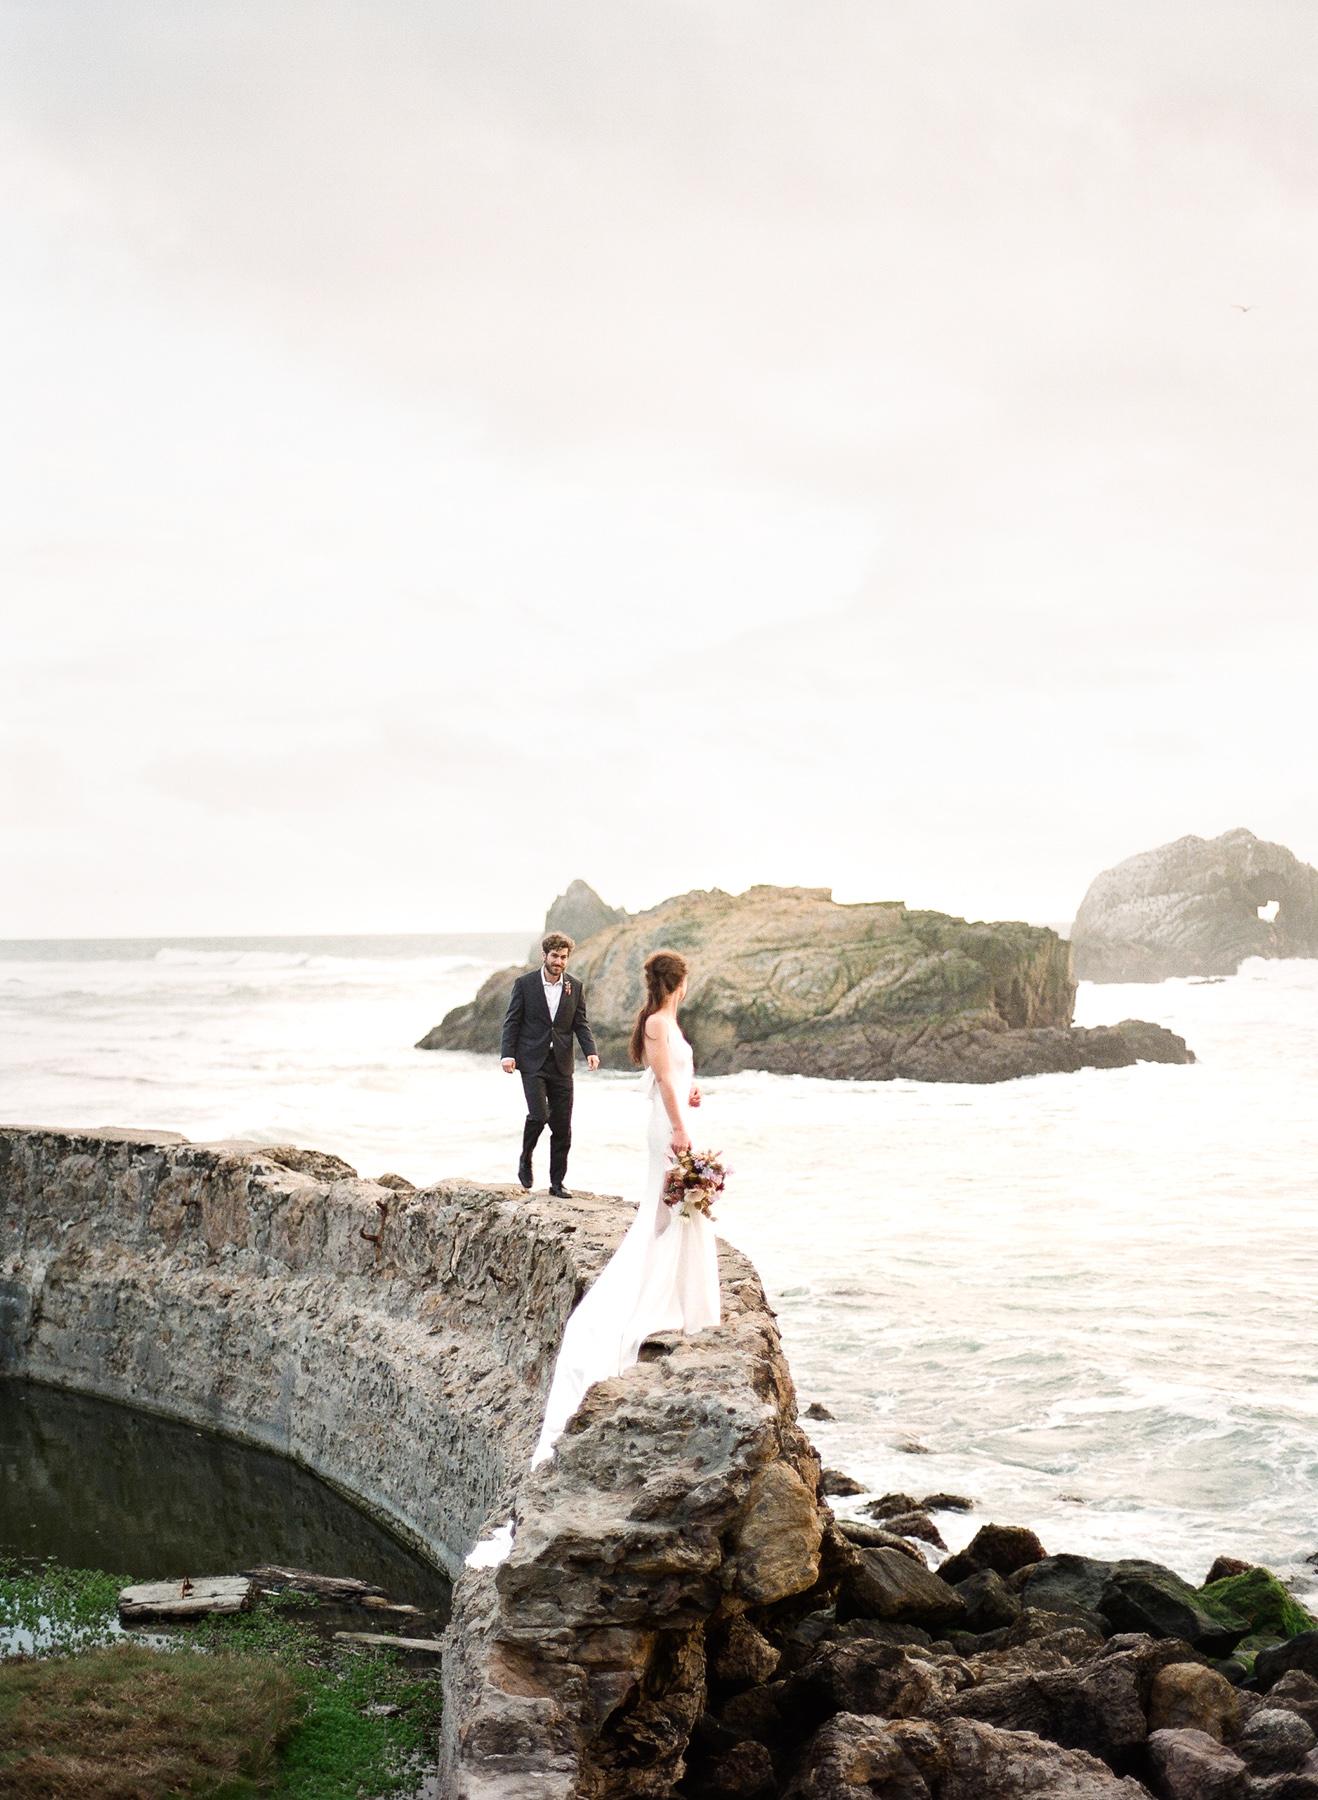 San-Francisco-Wedding-Film-Photography-32.jpg